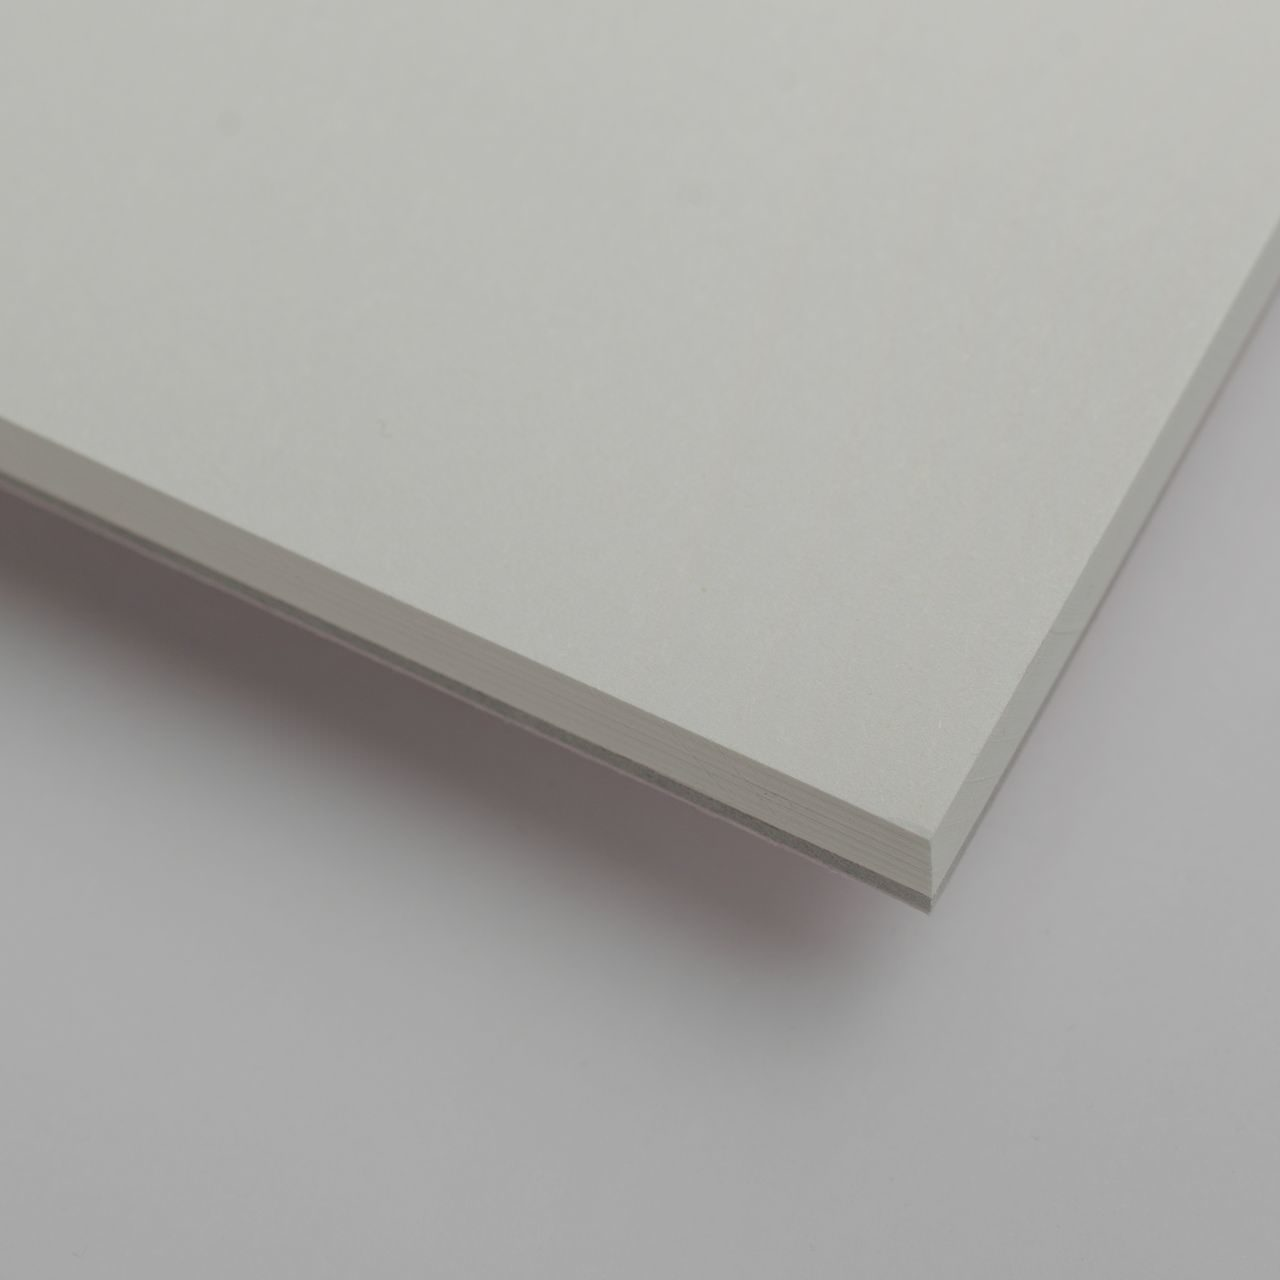 A4 Чёрный скетчпэд с перфорацией Falafel books Sketchpad Black A4